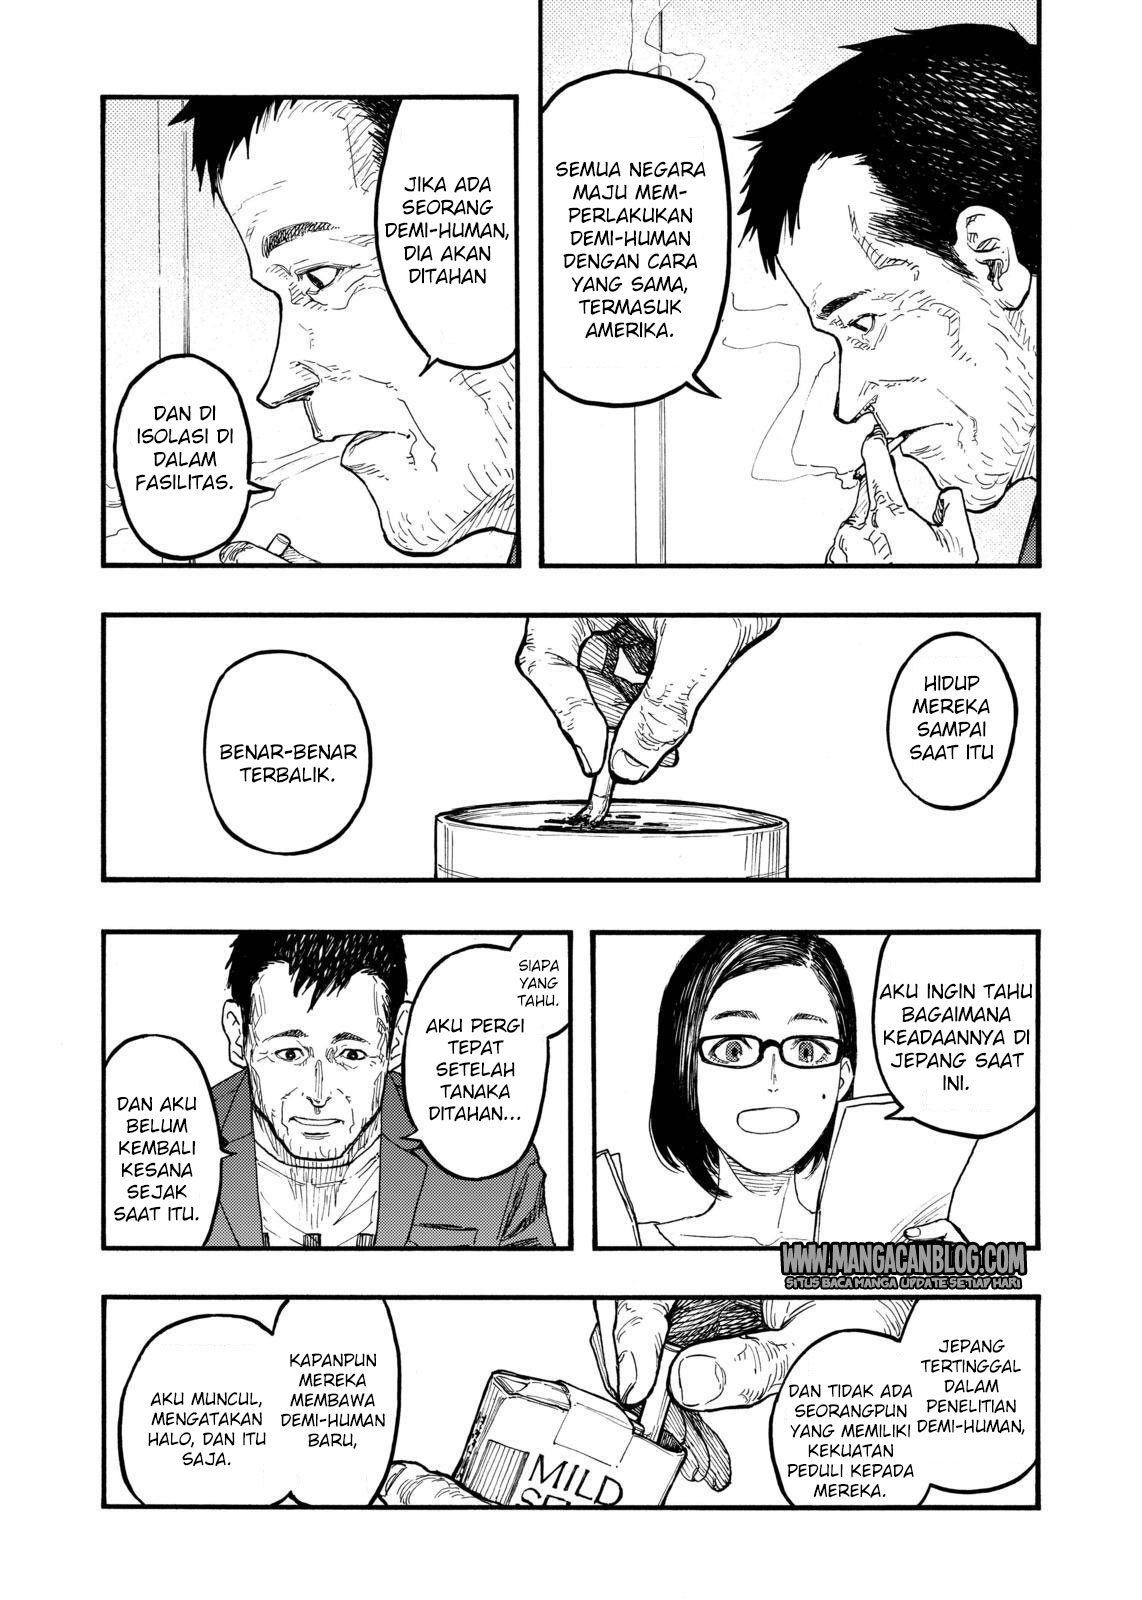 Dilarang COPAS - situs resmi www.mangacanblog.com - Komik ajin 046 - selamat pagi, sampai jumpa besok 47 Indonesia ajin 046 - selamat pagi, sampai jumpa besok Terbaru 20|Baca Manga Komik Indonesia|Mangacan